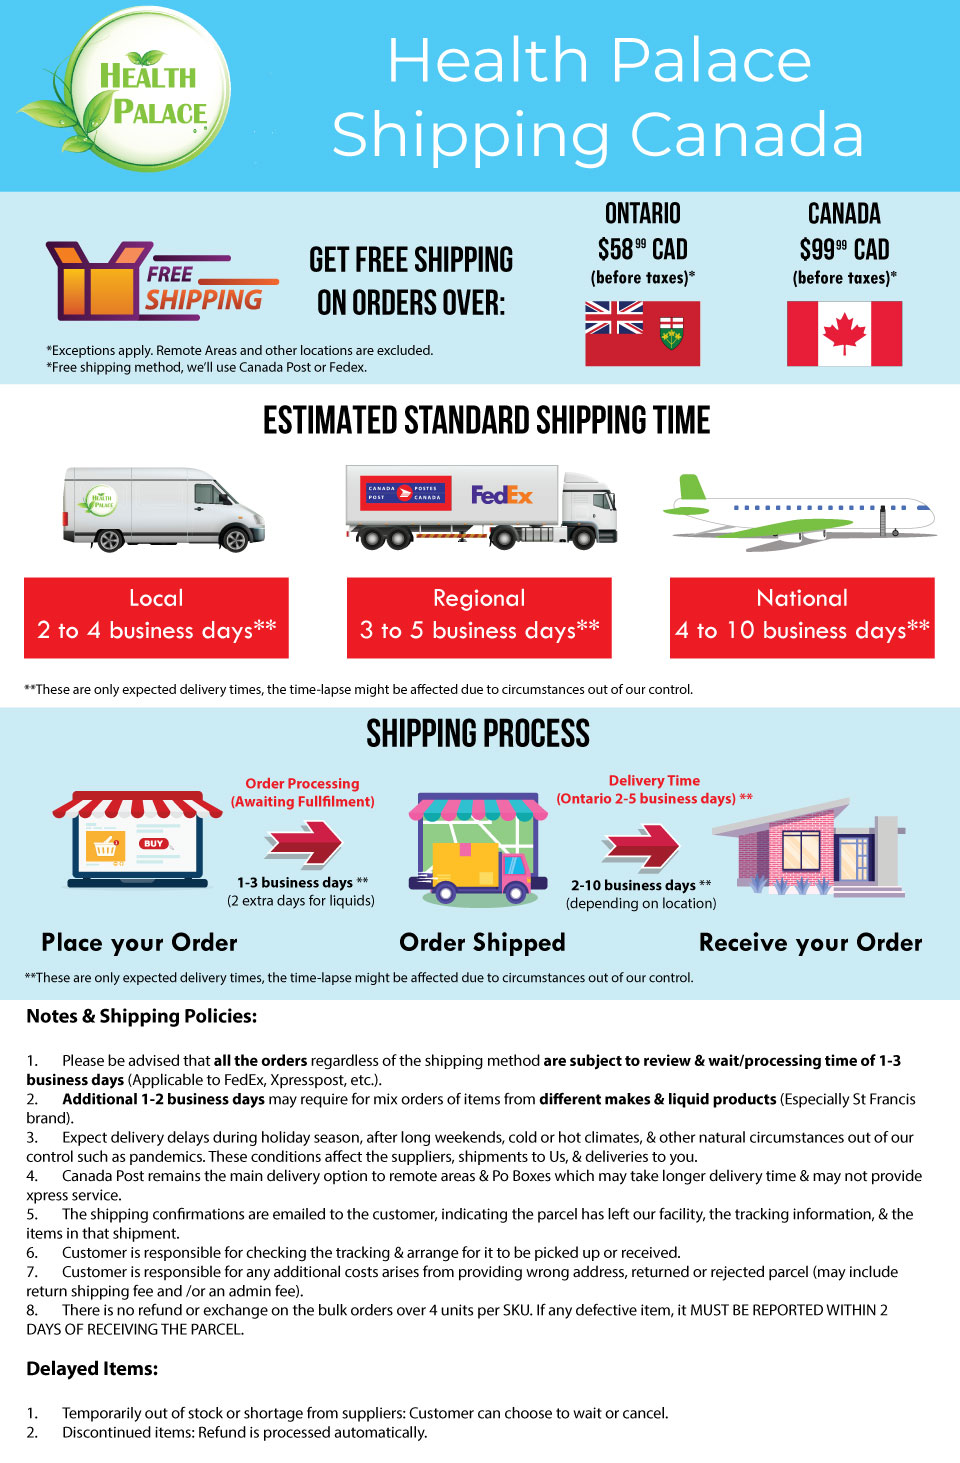 health-palace-shipping-canada-july-2021-5.jpg